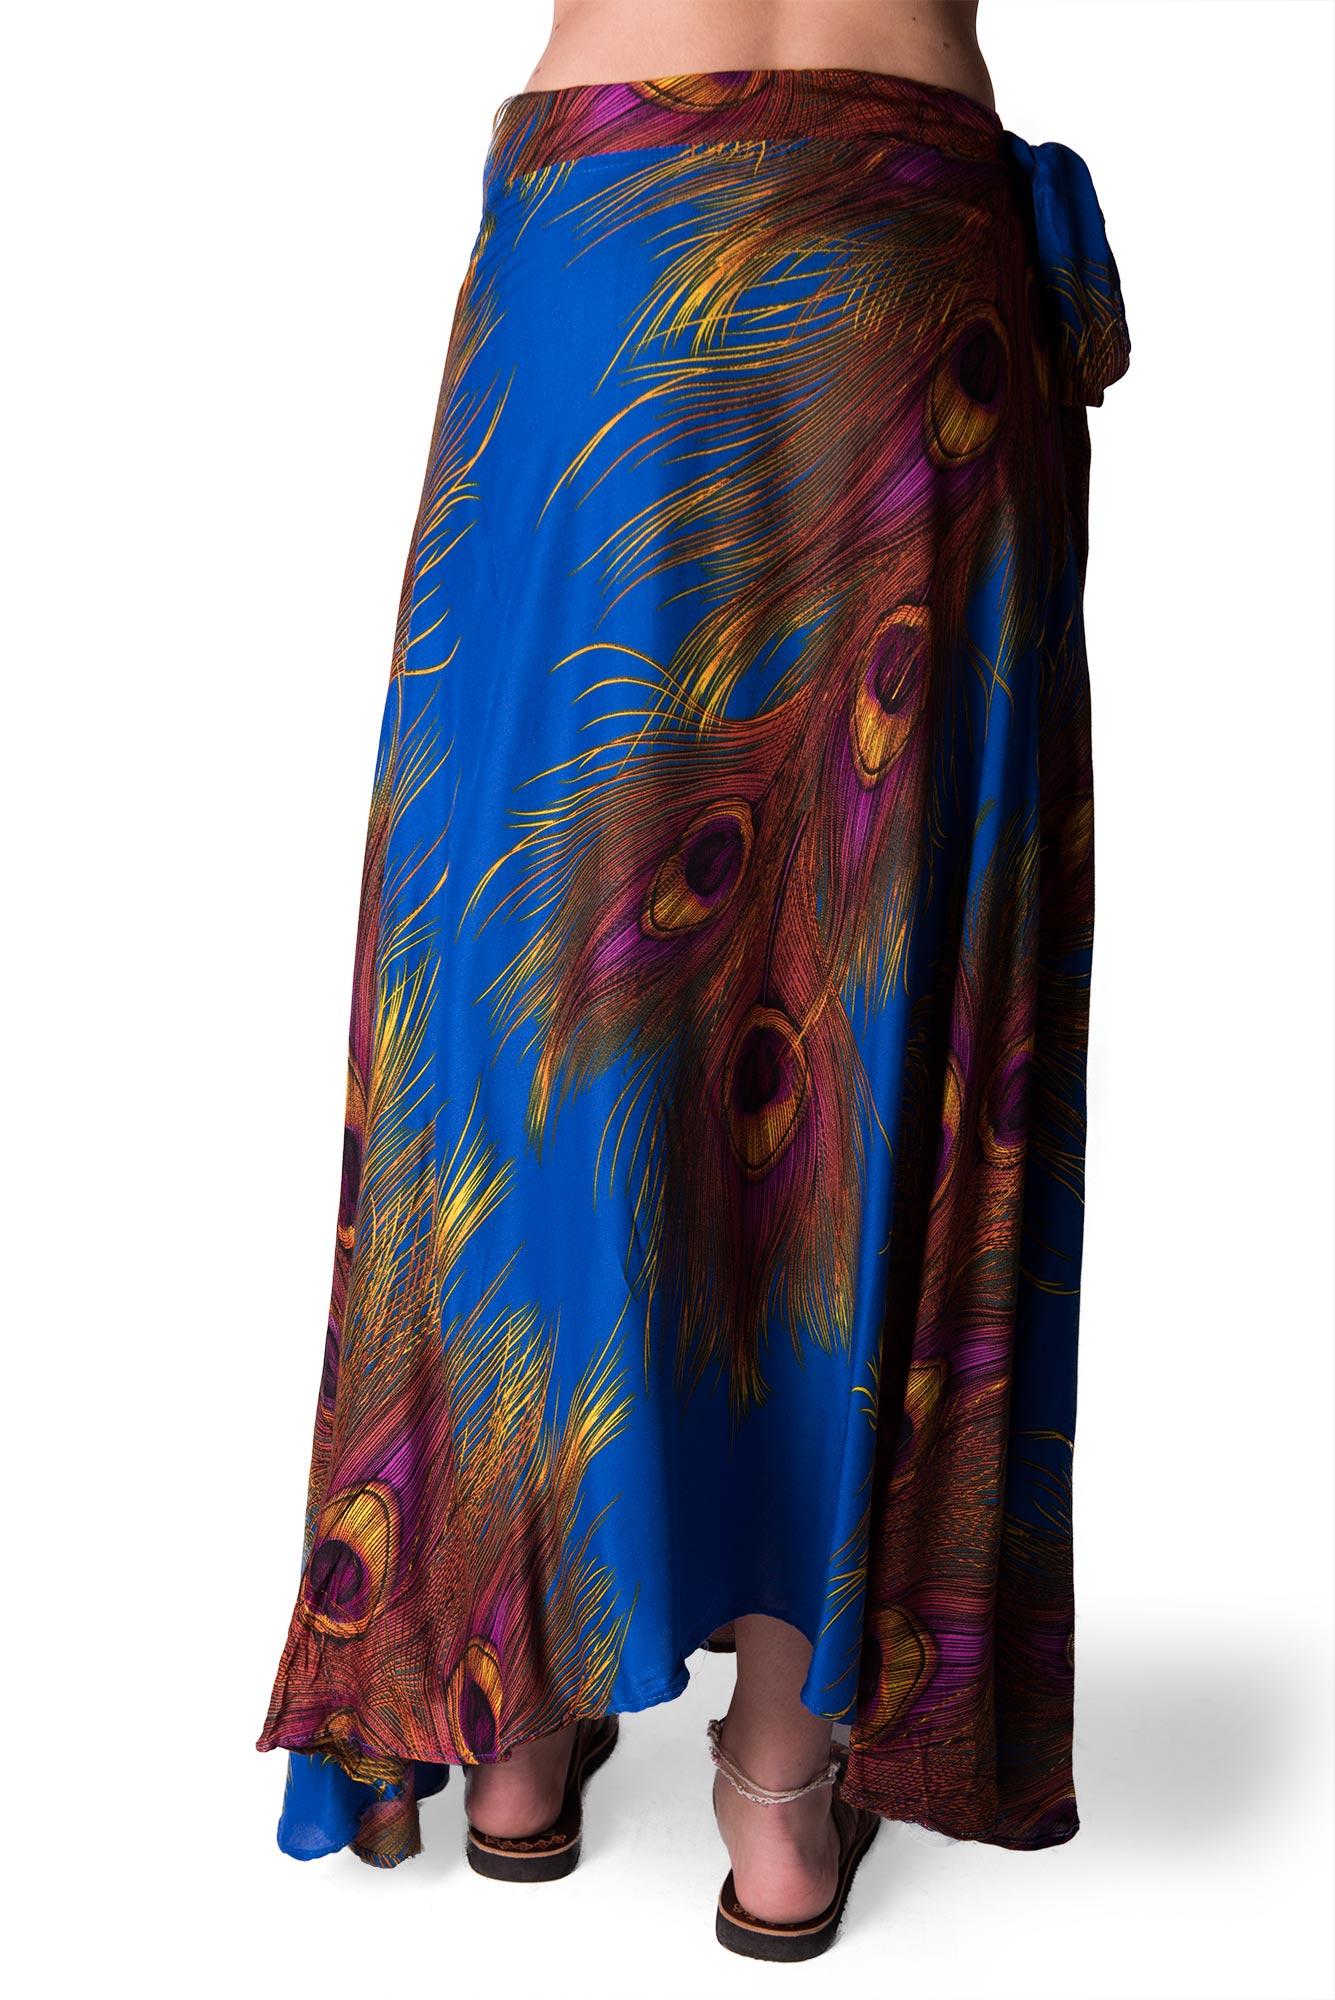 Long Wrap Skirt, Peacock Print, Blue